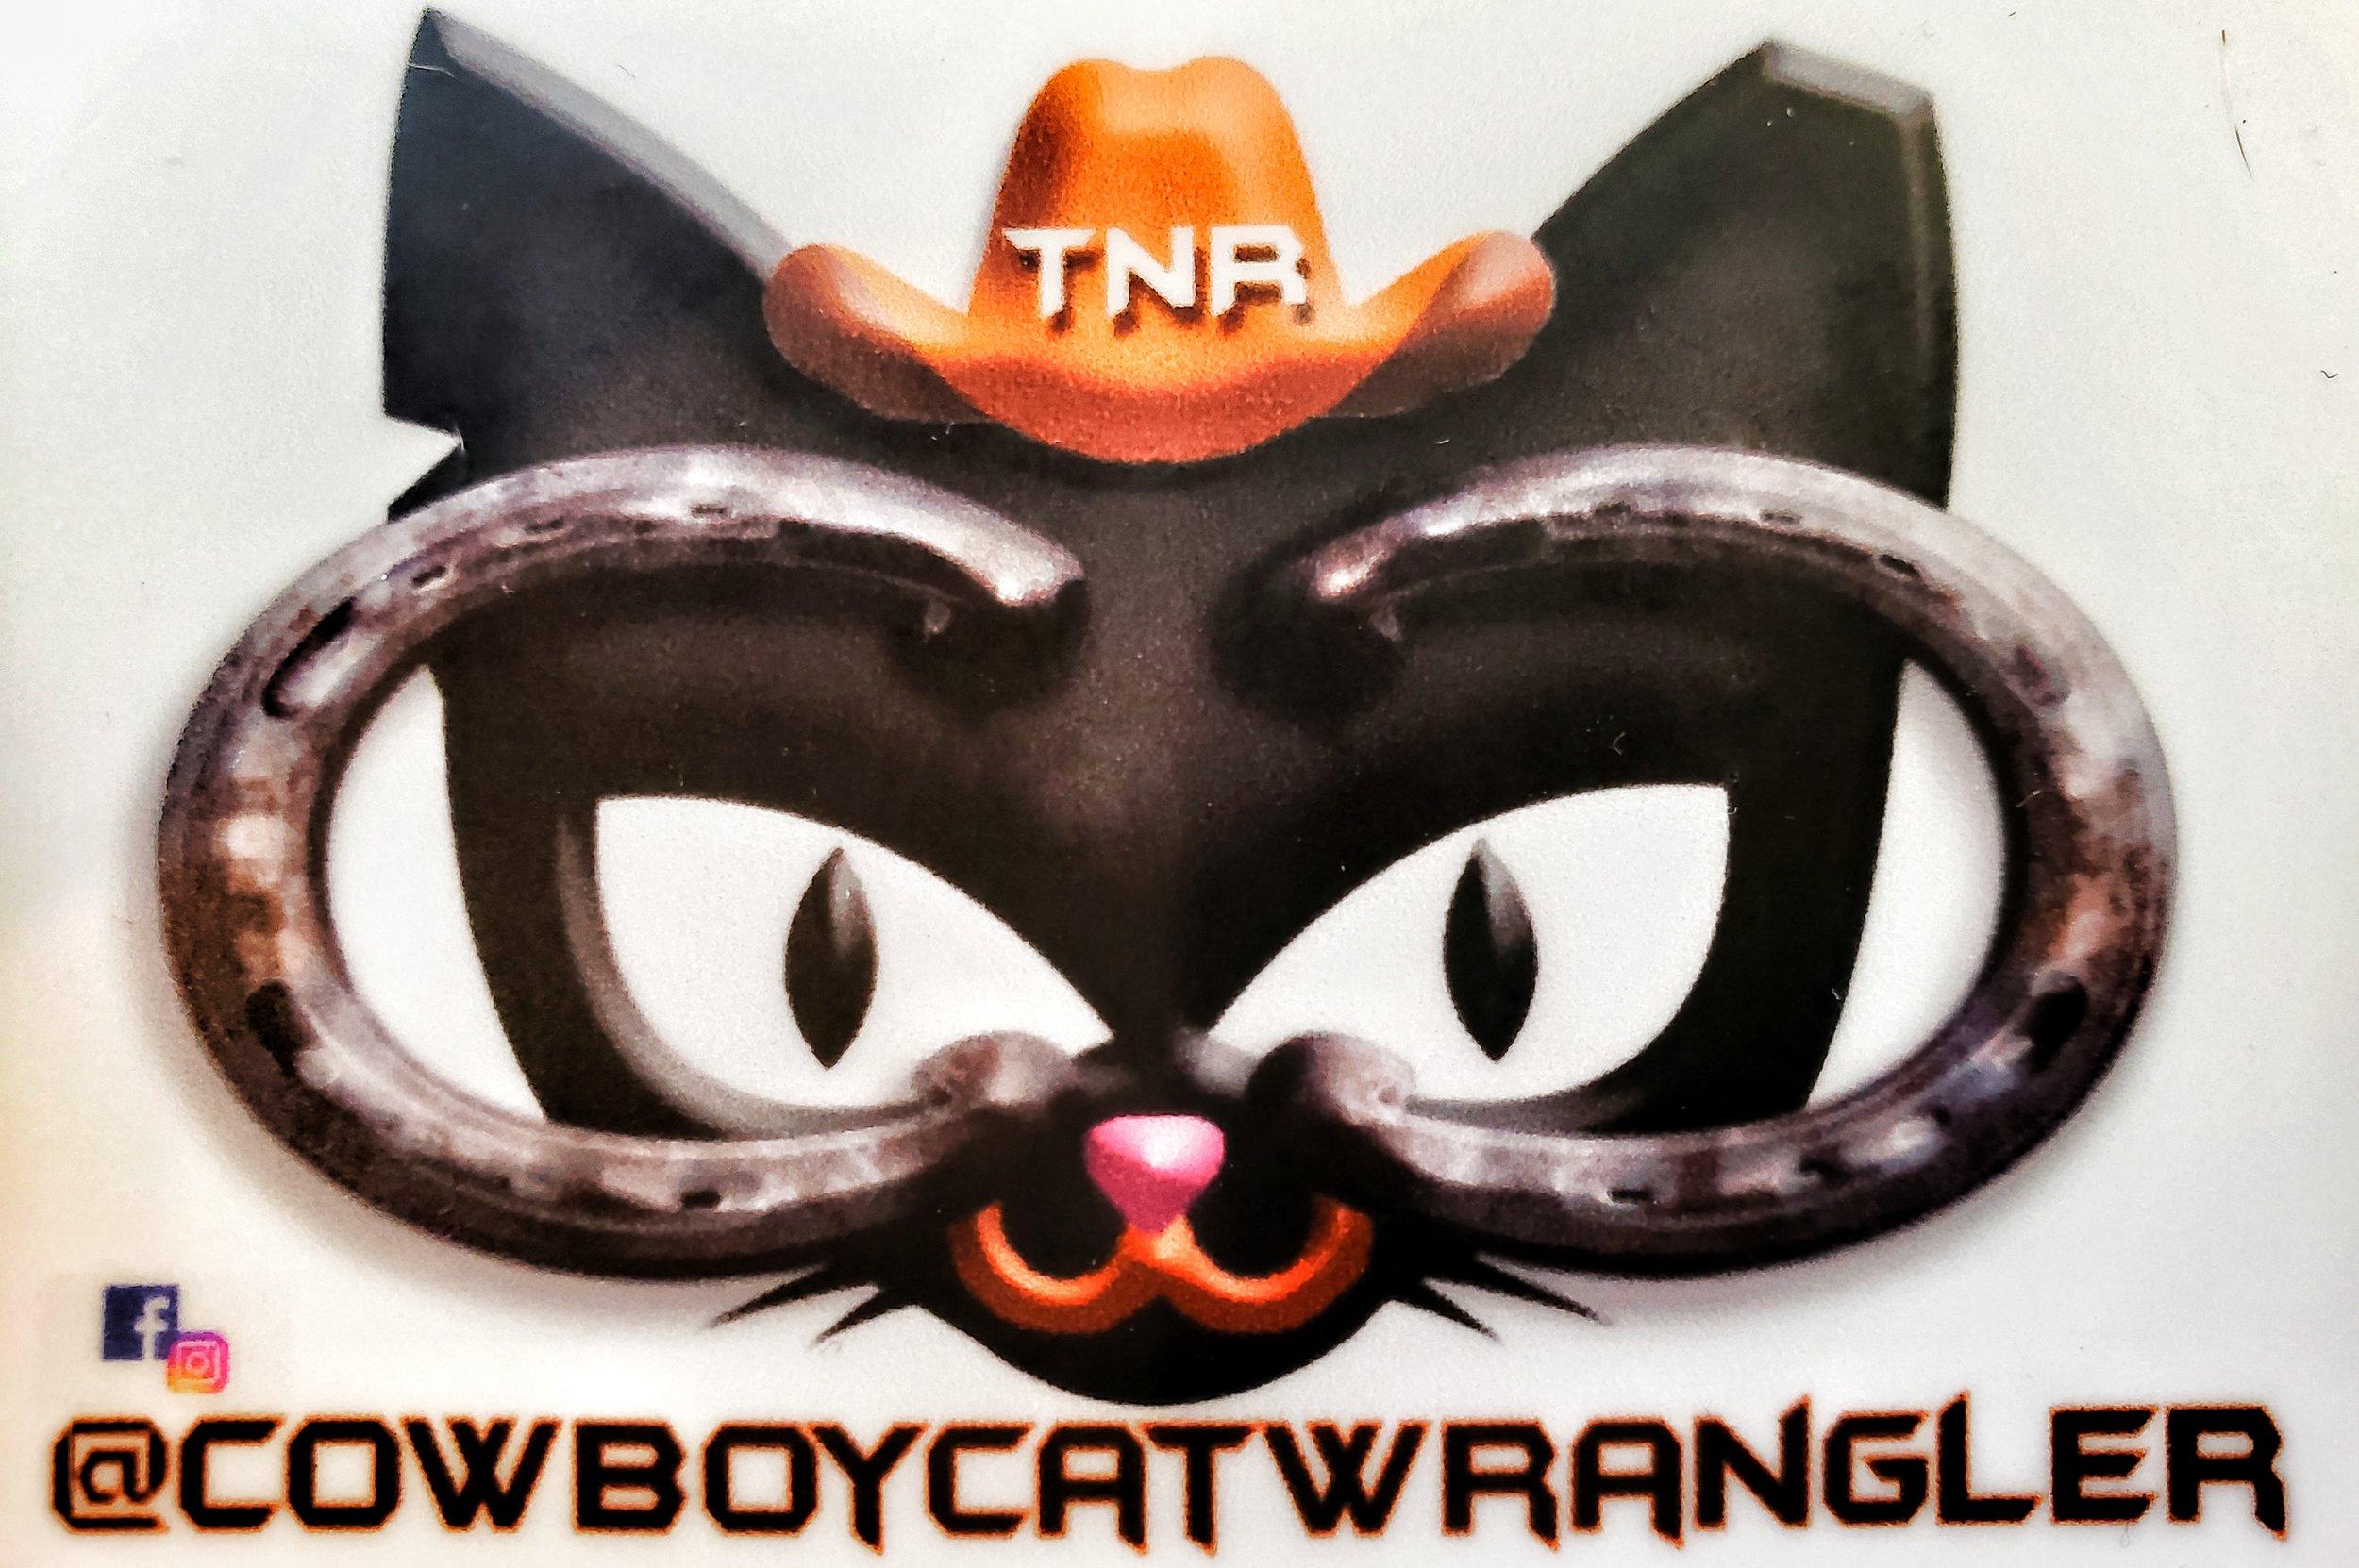 Cowboy Cat Wrangler